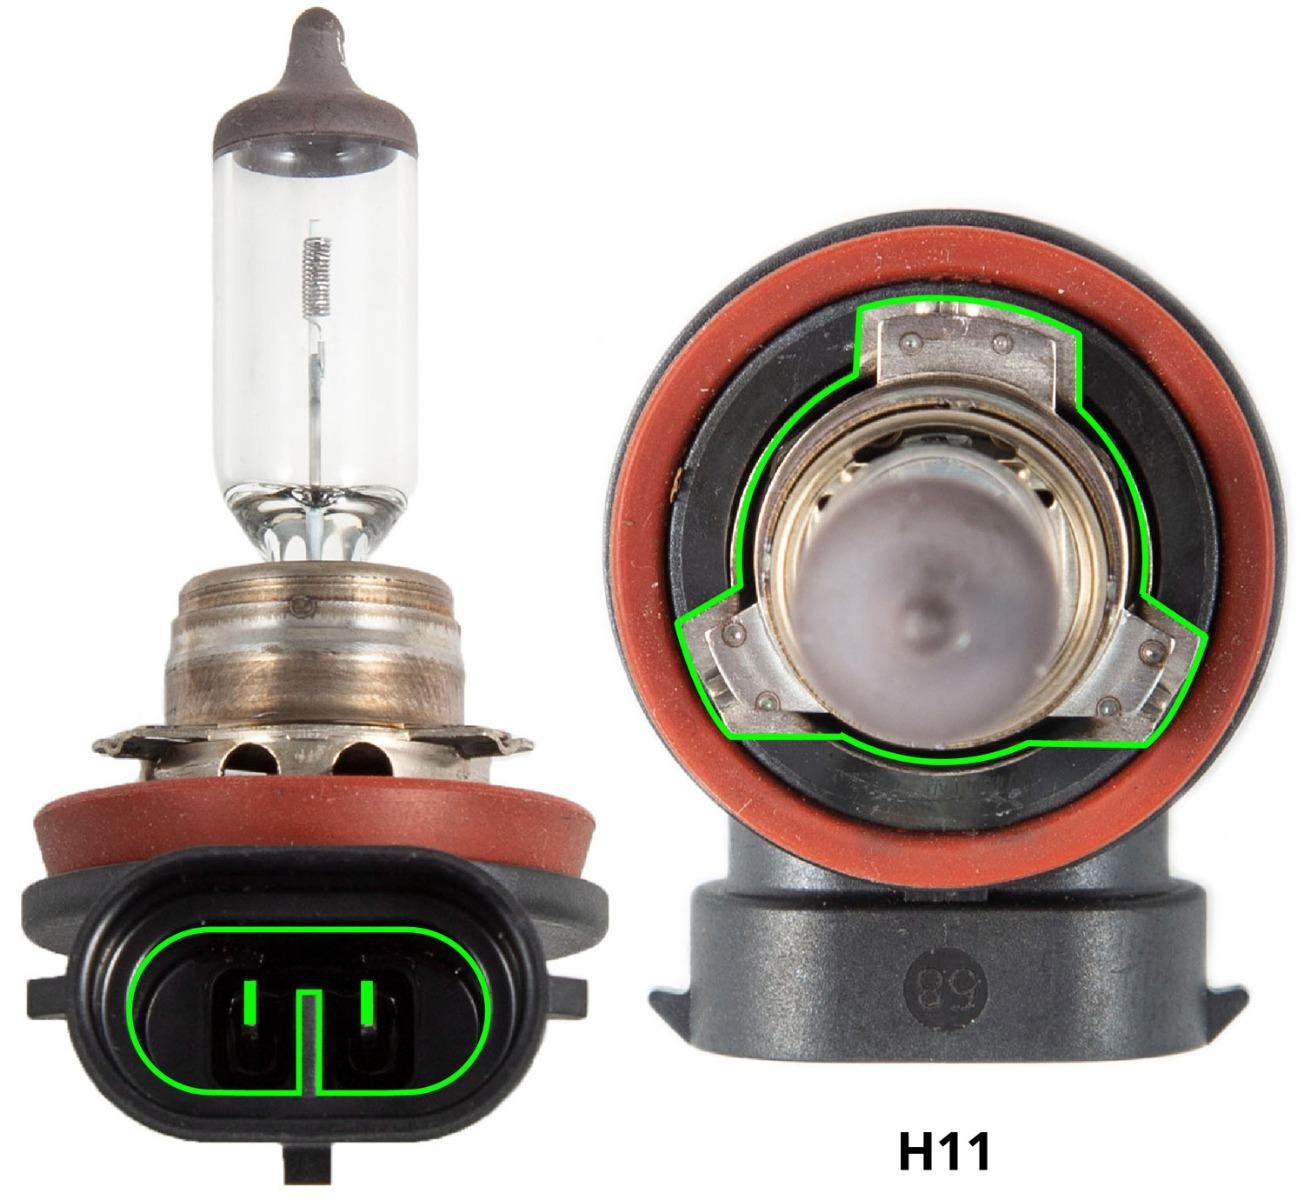 H11 stock bulb